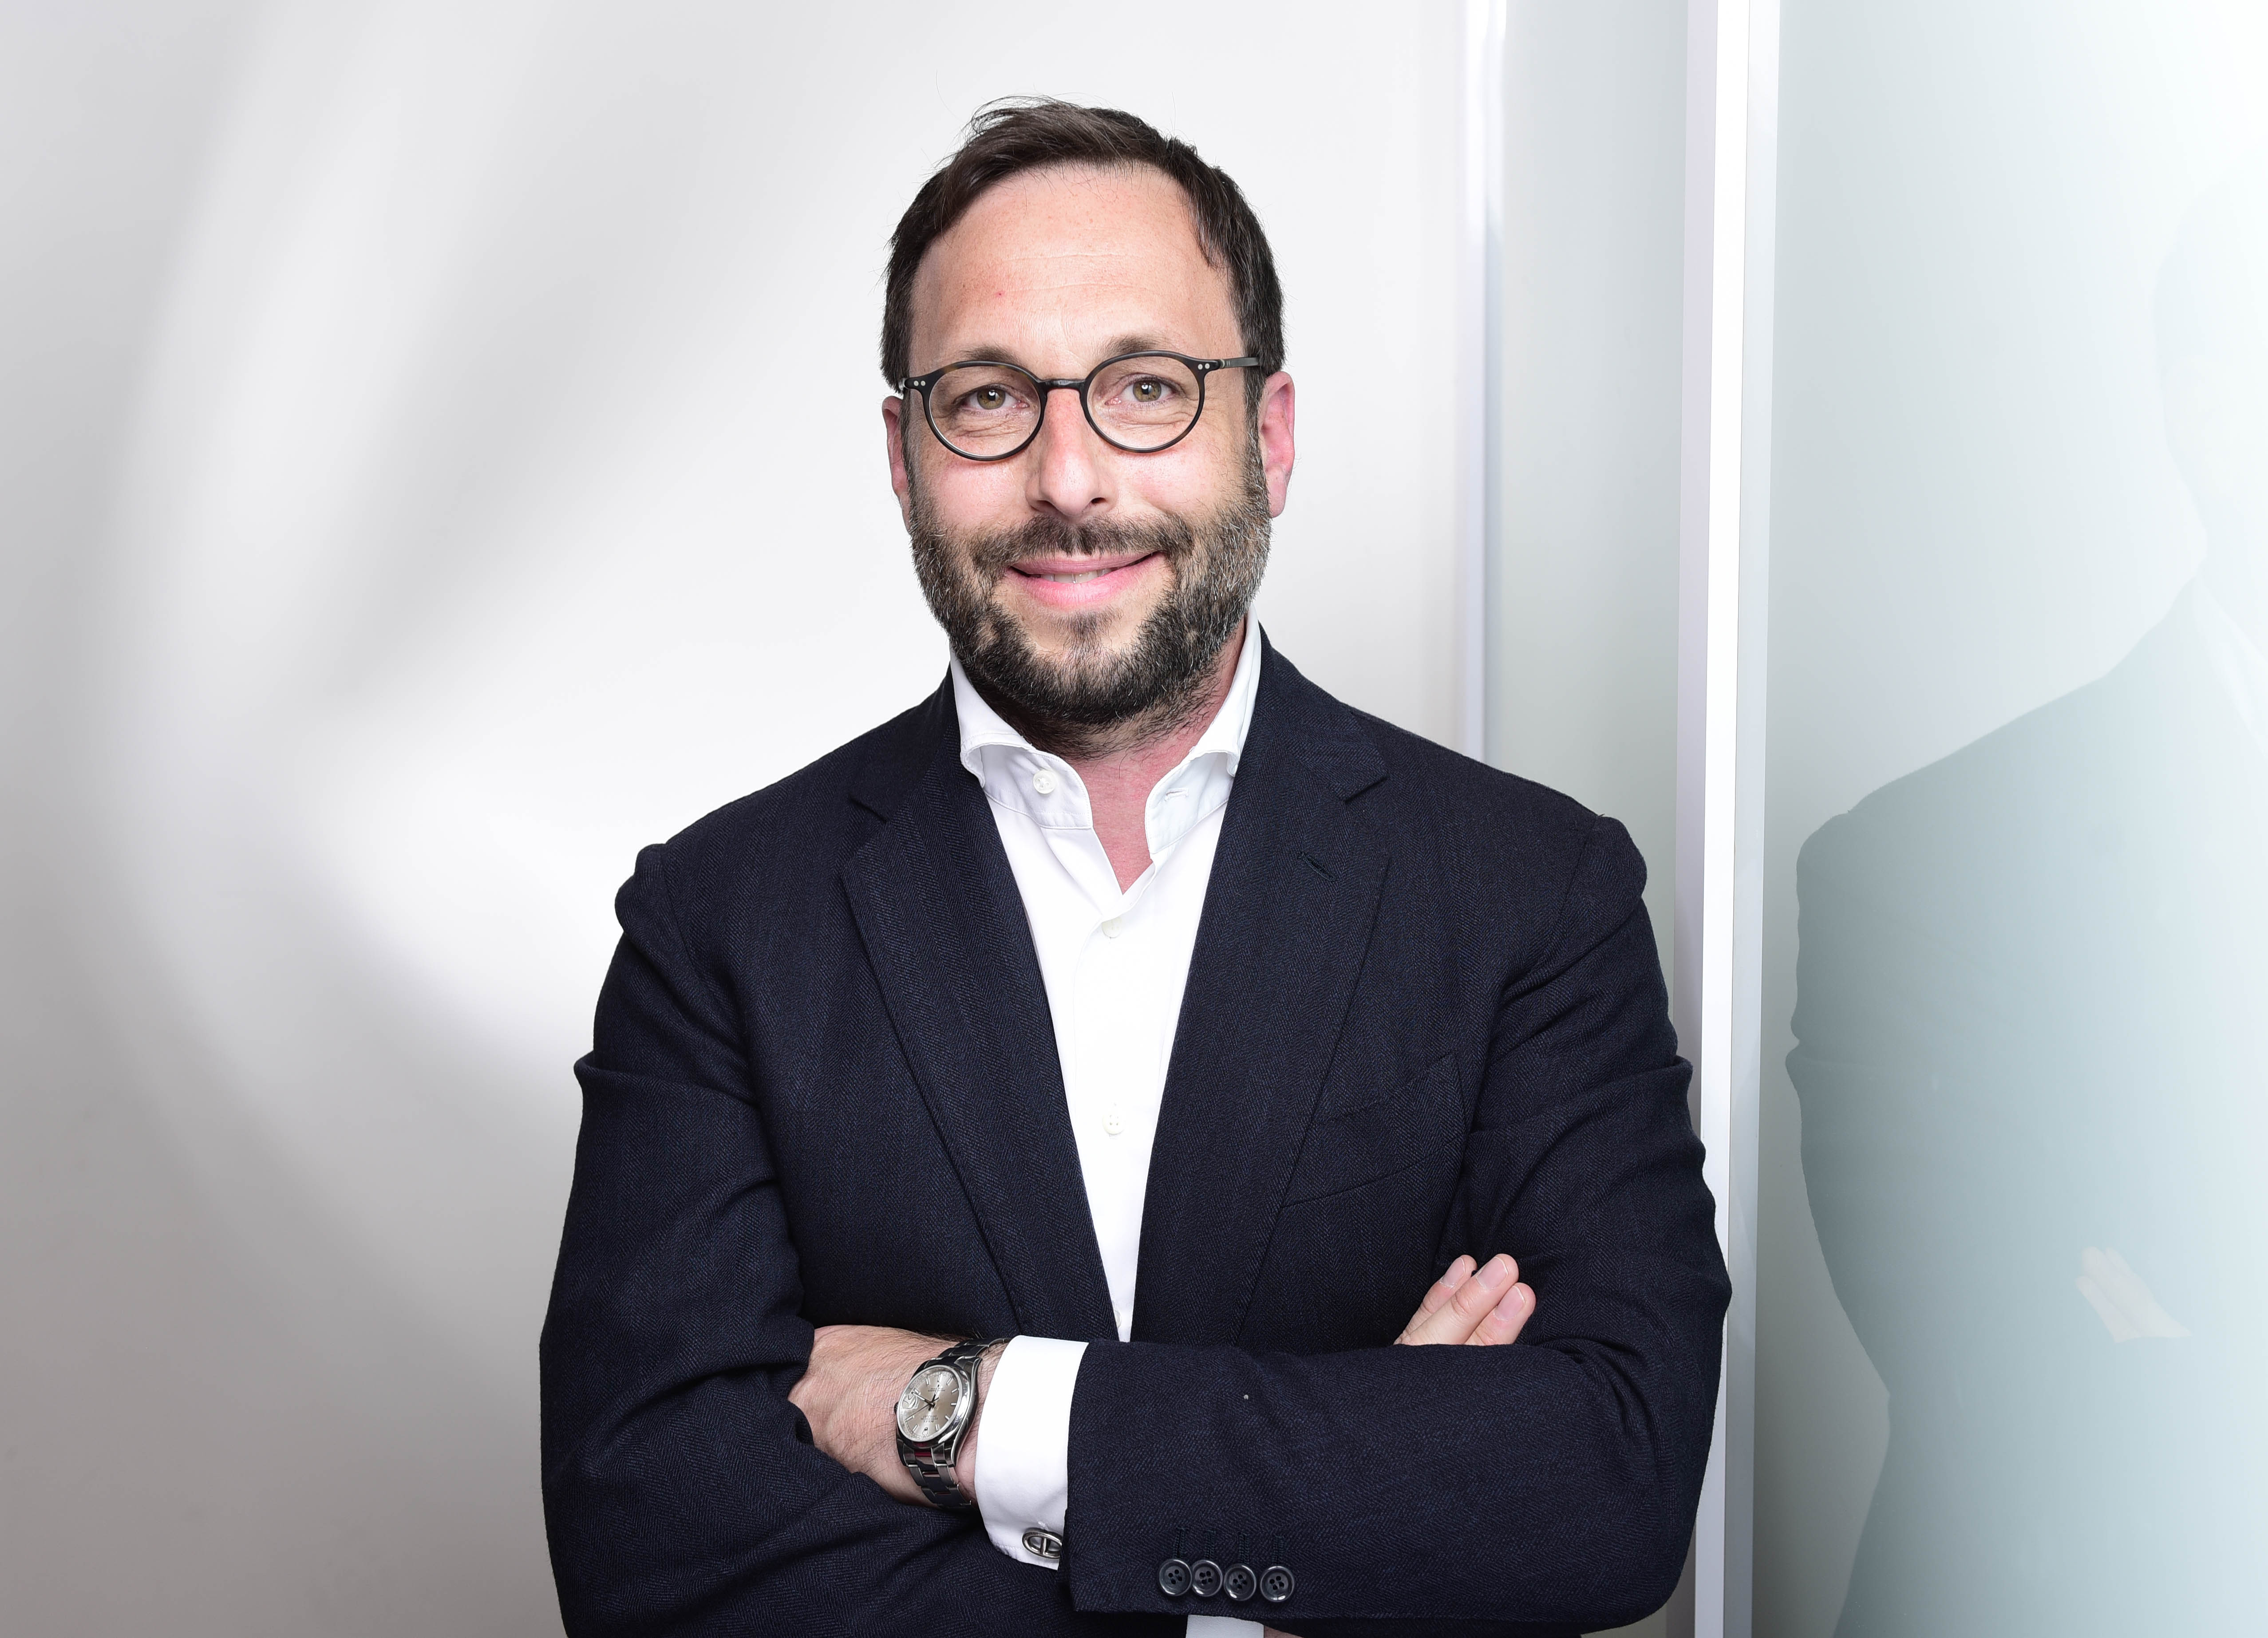 Christoph Bregulla